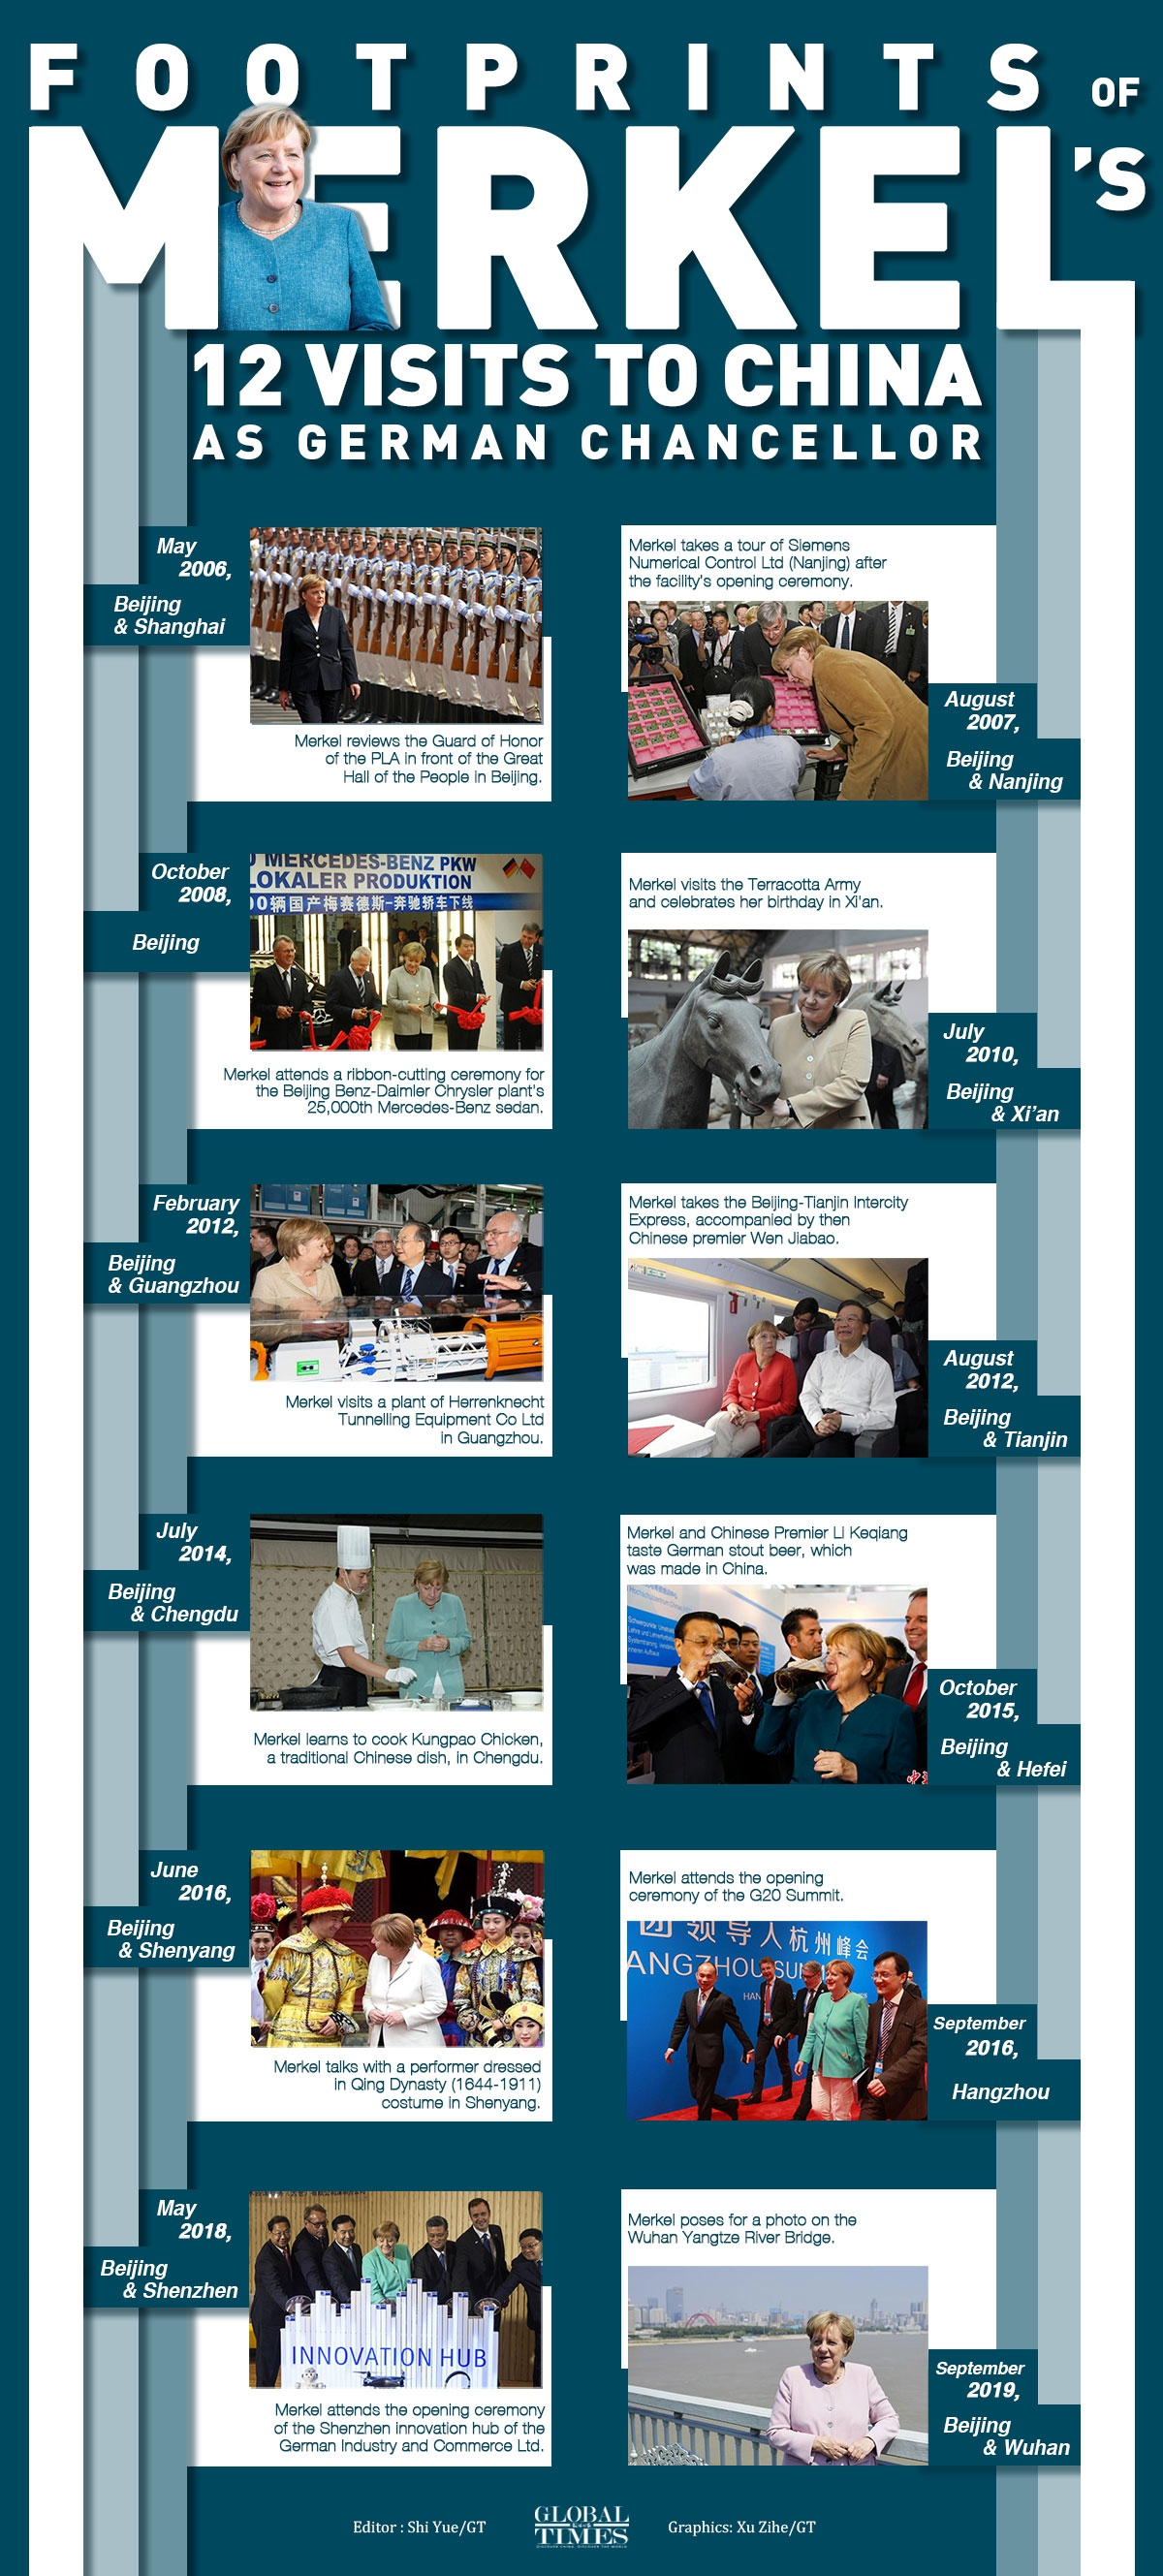 Footprints of Merkel's 12 visits to China as German Chancellor Graphic: Xu Zihe/GT